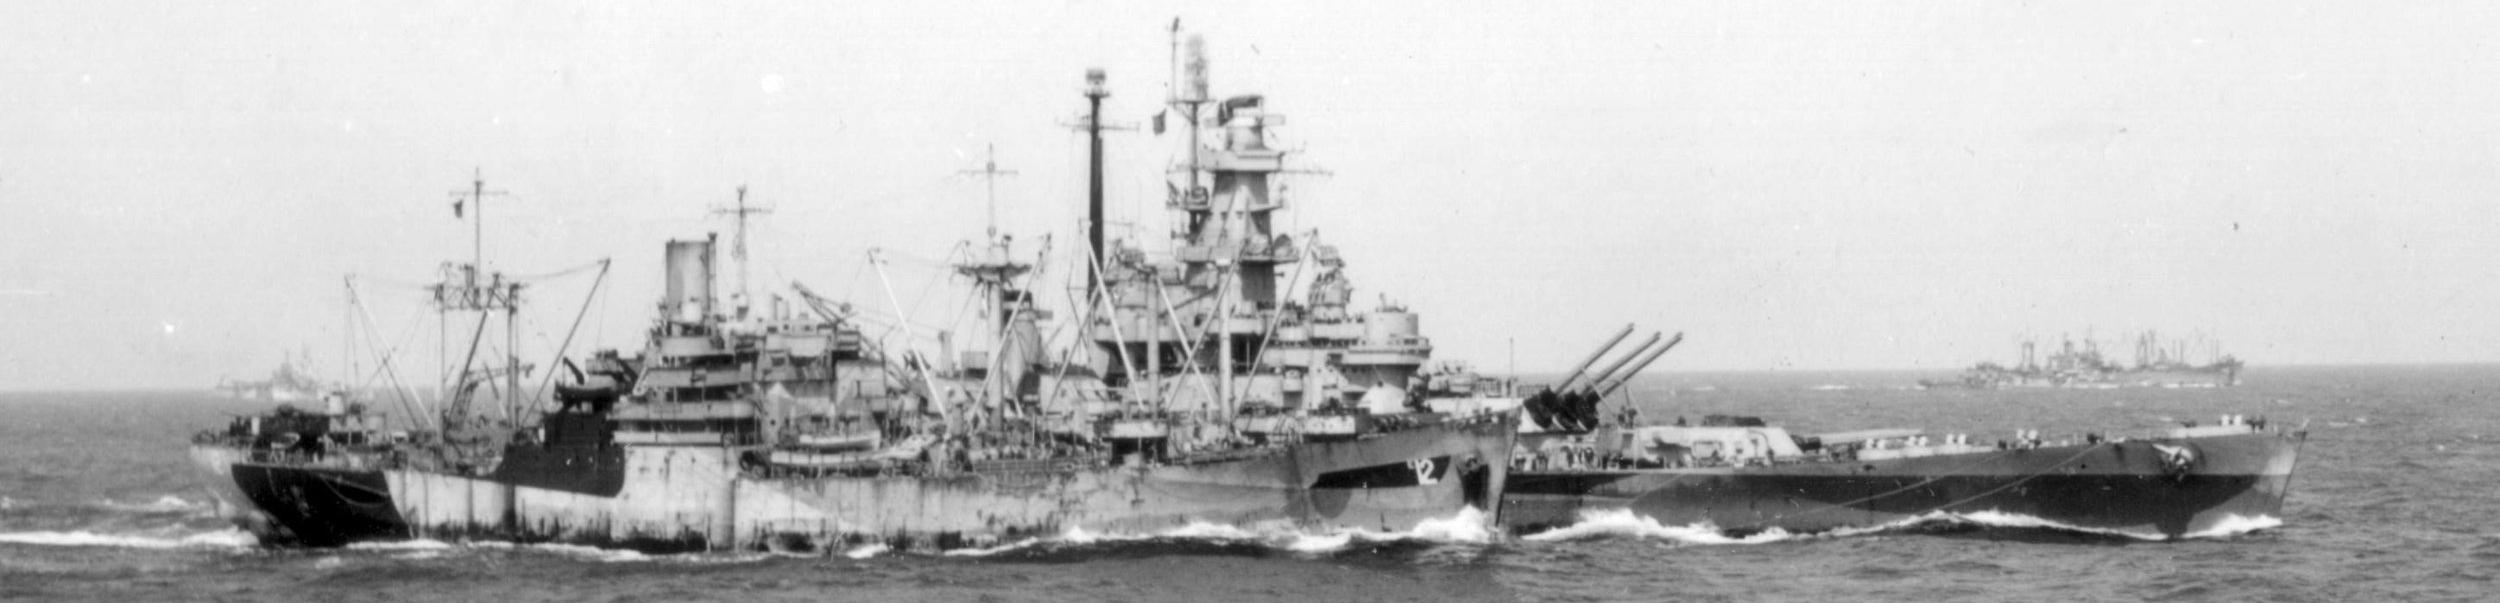 USS_Wrangell_(AE-12)_replenishing_USS_Massachusetts_(BB-59)_in_1945.jpg